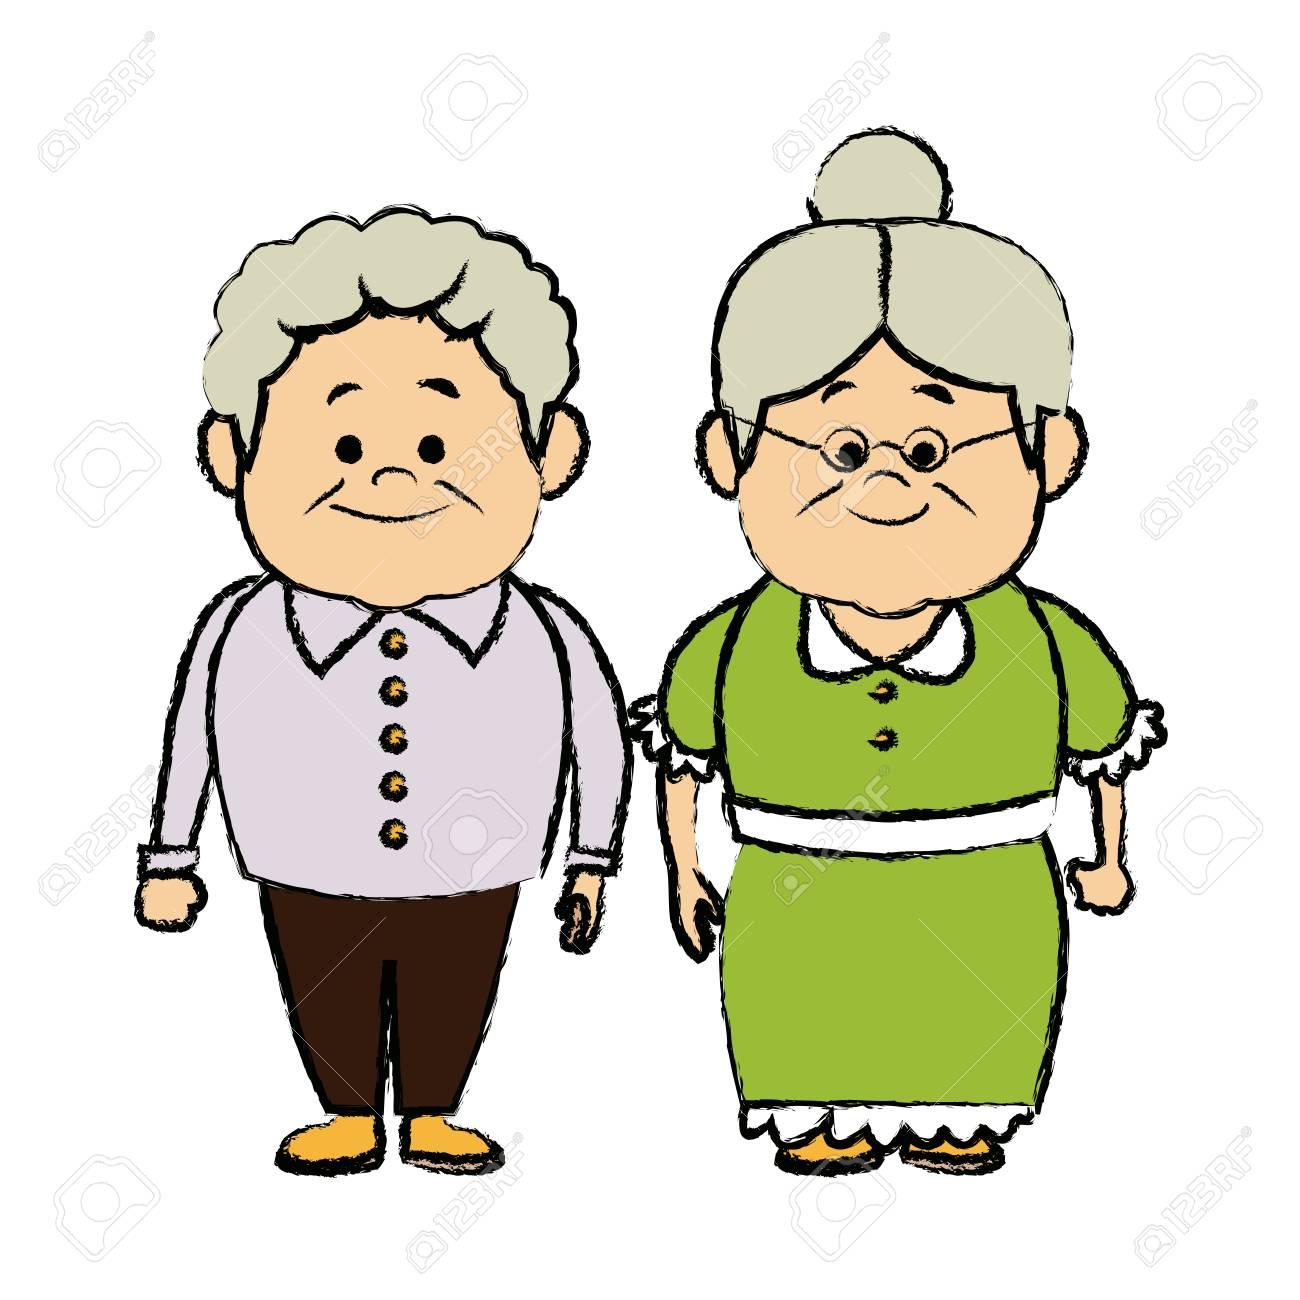 grandpa and grandma standing lovely image vector illustration.